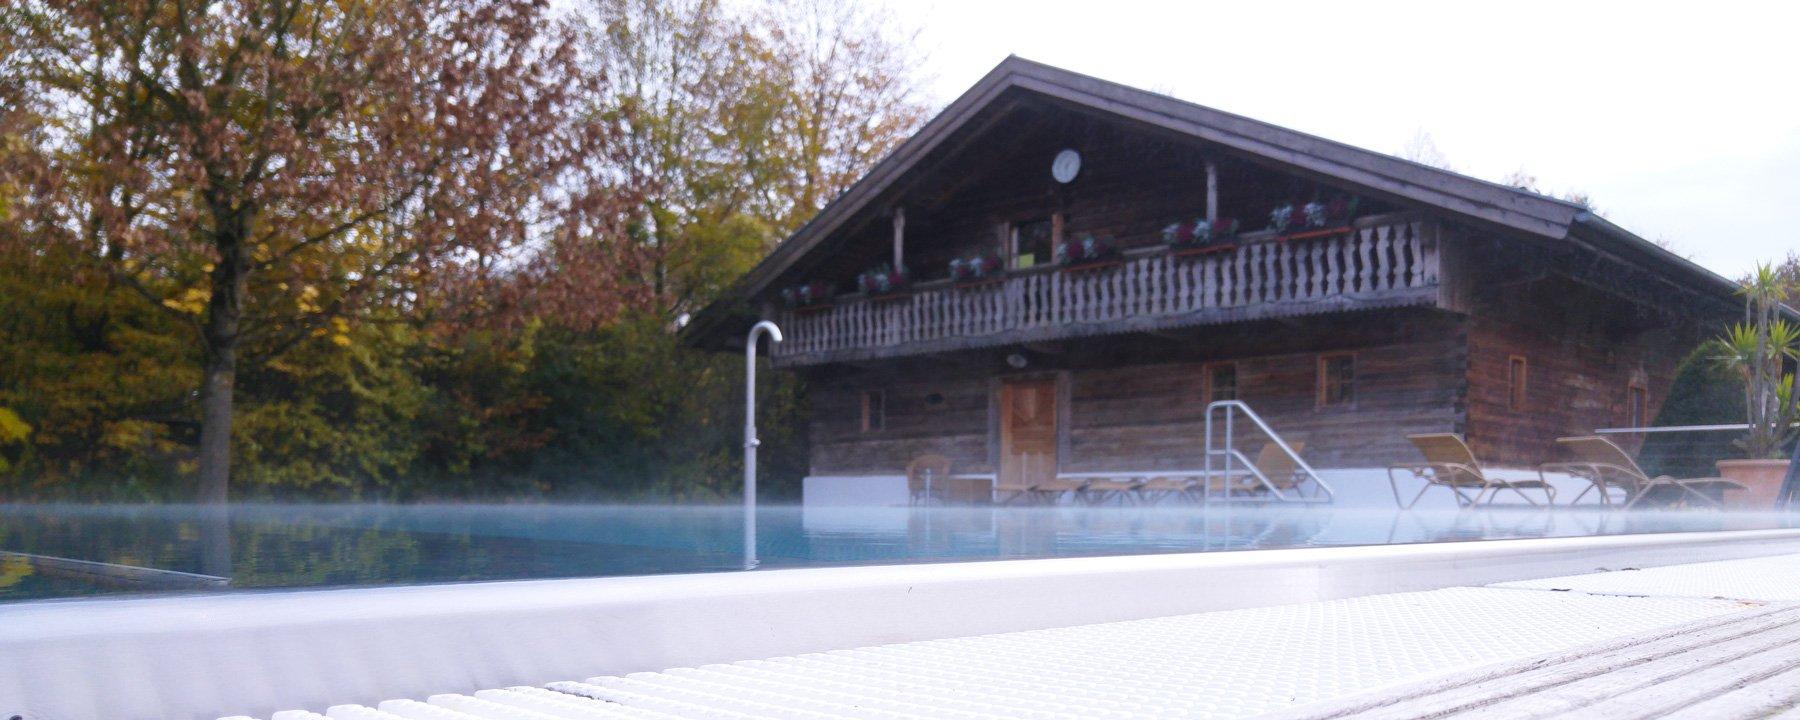 Außenpool, Saunastadl, Hotelbar, Restaurant, Hirsch, Hotel 3Quellen-Therme, Bad Griesbach, Wellness, Beauty, Conny Doll Lifestyle